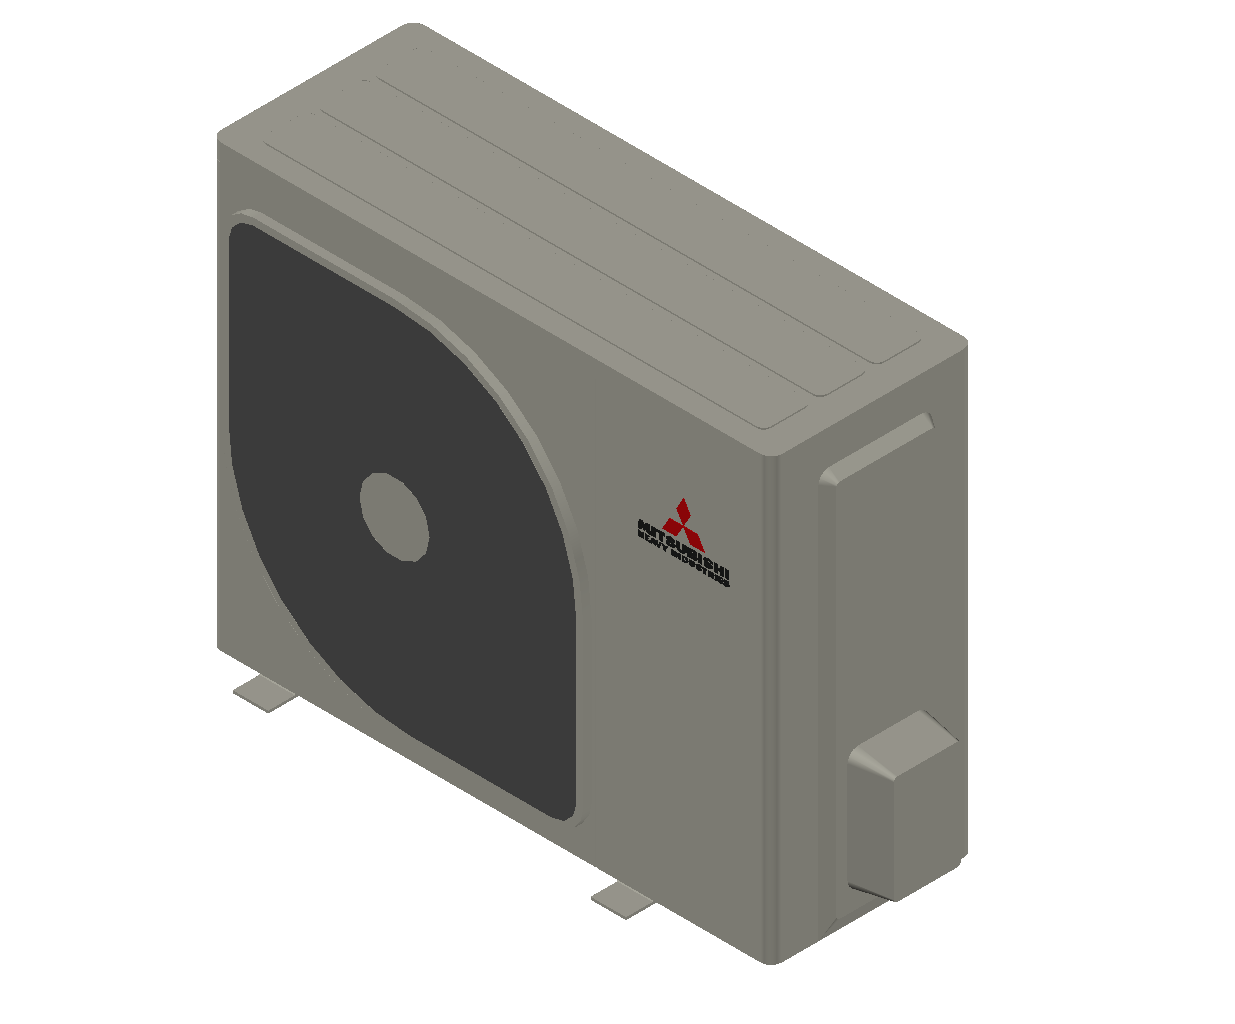 HC_Heat Pump_MEPcontent_Mitsubishi Heavy Industries_PAC-RAC_SRC20ZSX-S_INT-EN.dwg